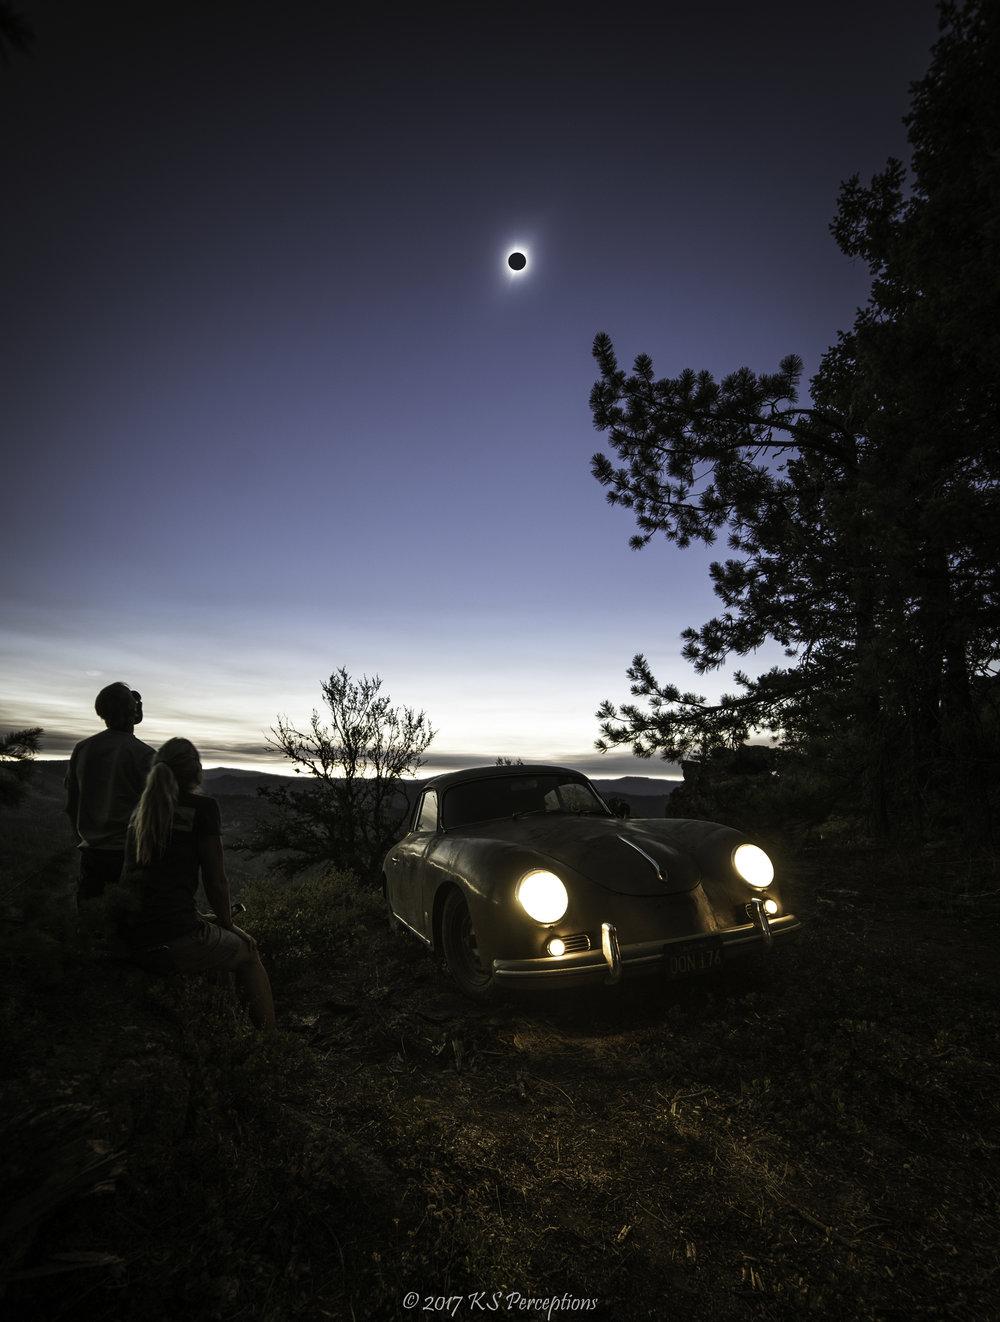 2017 Total Eclipse with Matt Hummel and Friends